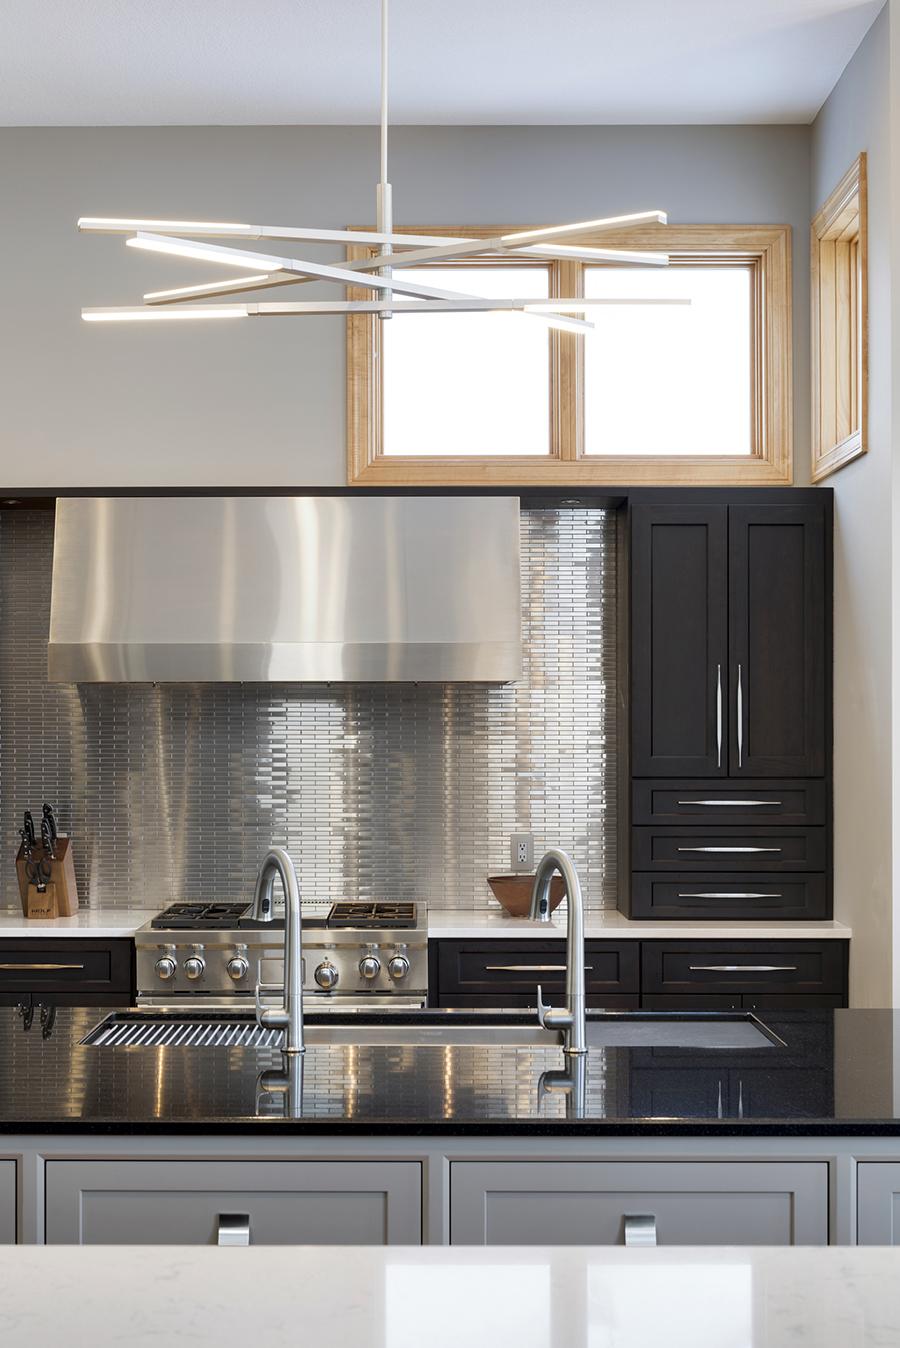 Belle Kitchen Interior Design Designer Luxury Minnesota MN Mpls Minneapolis St Paul Twin Cities6.jpg